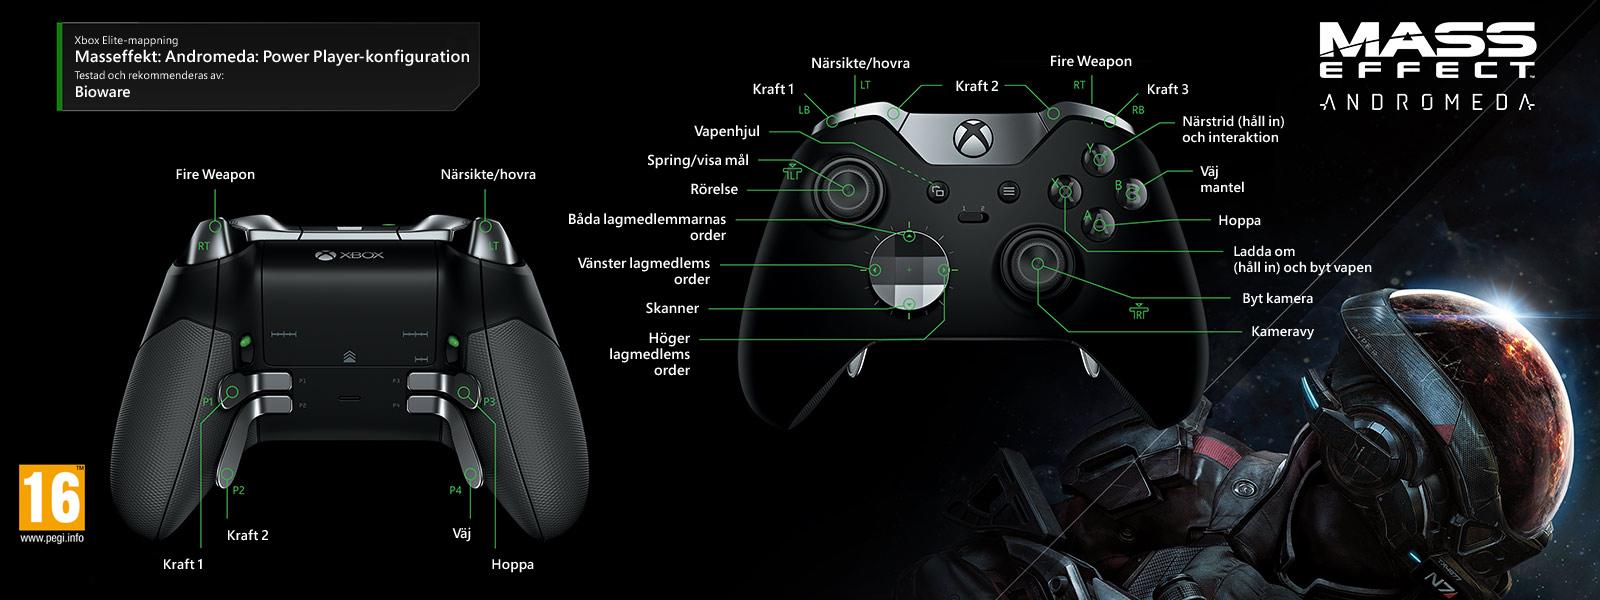 Mass Effect: Andromeda – Power Player-konfiguration